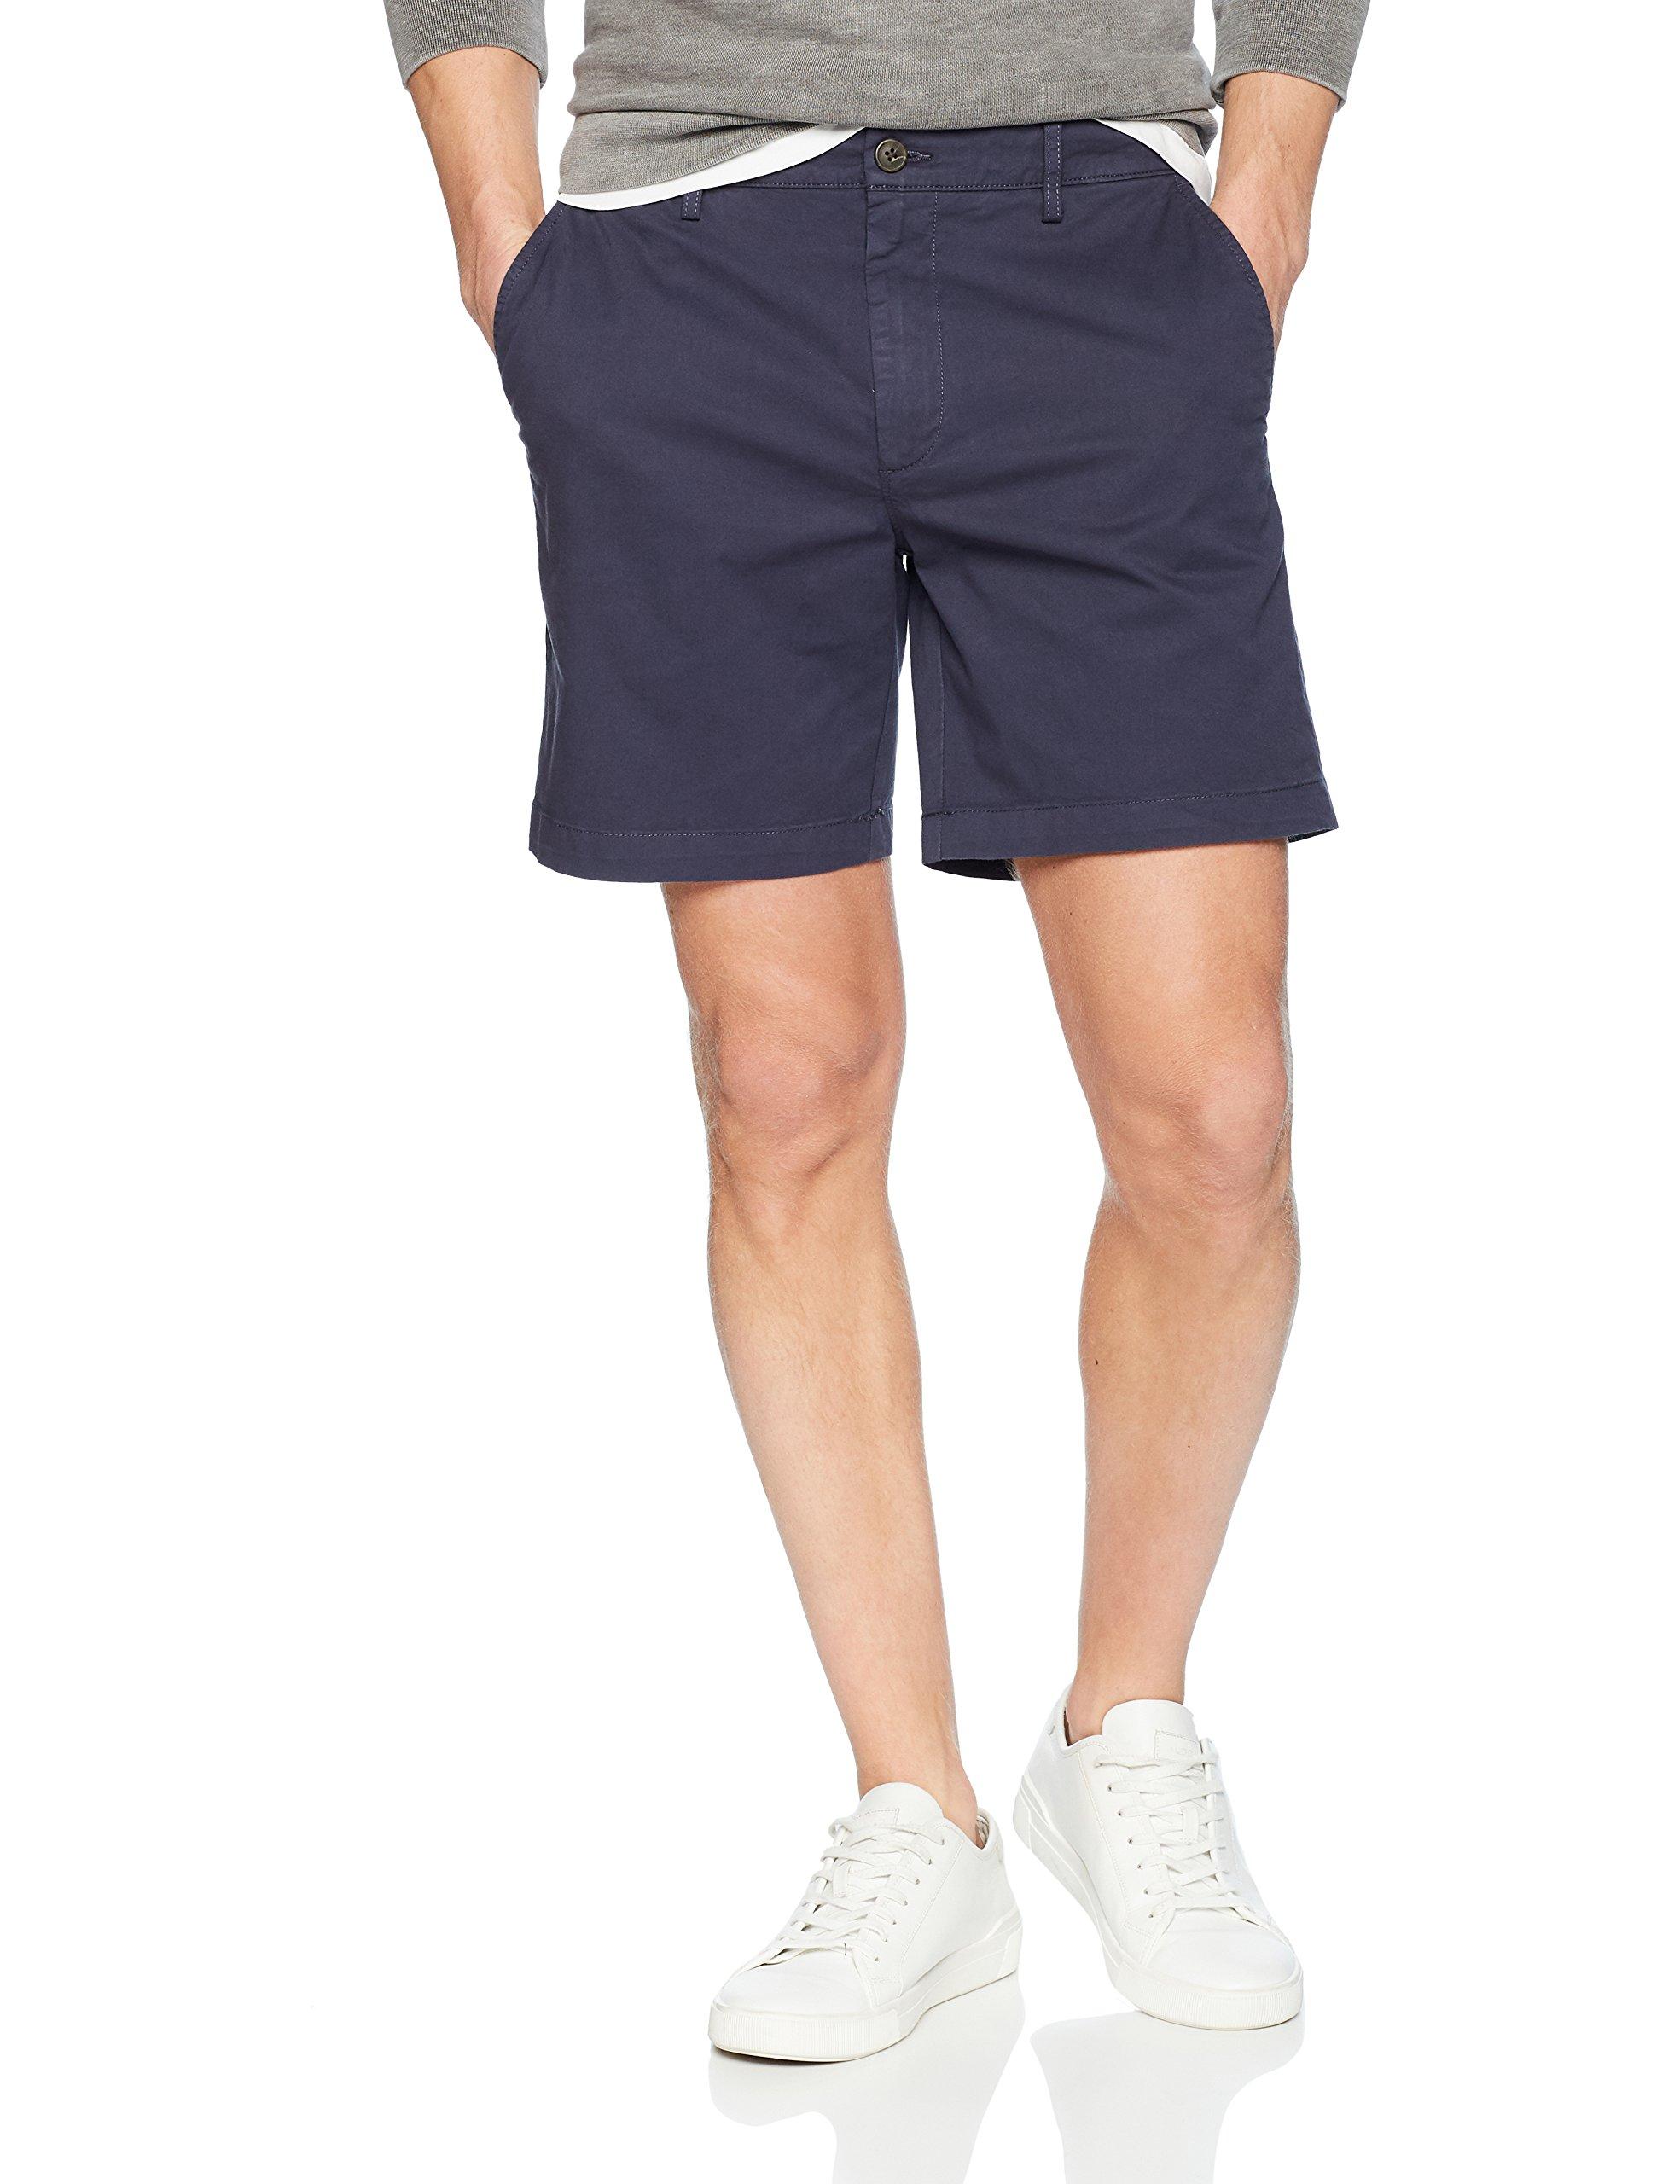 Goodthreads Men's 7'' Inseam Flat-Front Stretch Chino Short, Navy, 36